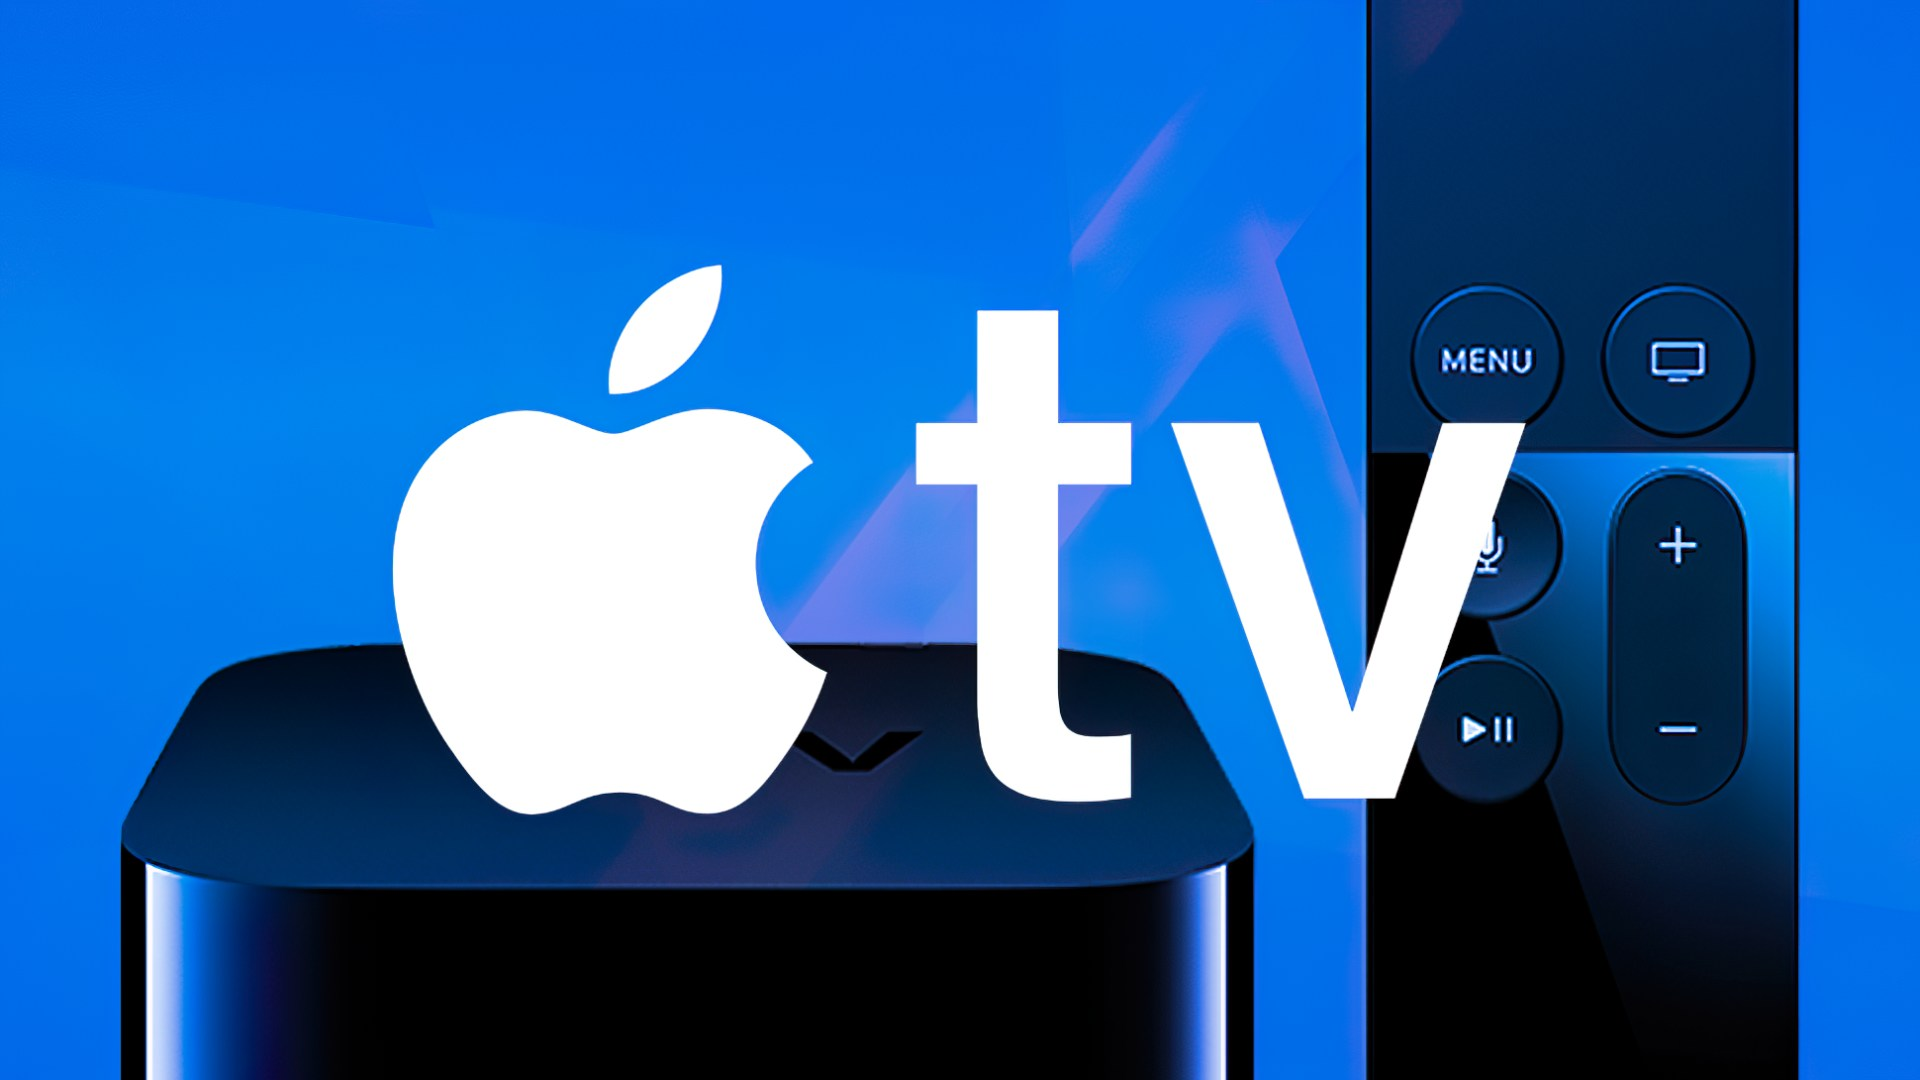 Apple, Streaming, Logo, Videostreaming, Apple Tv, Apple TV+, Apple TV App, Apple TV 4K, Apple TV Plus